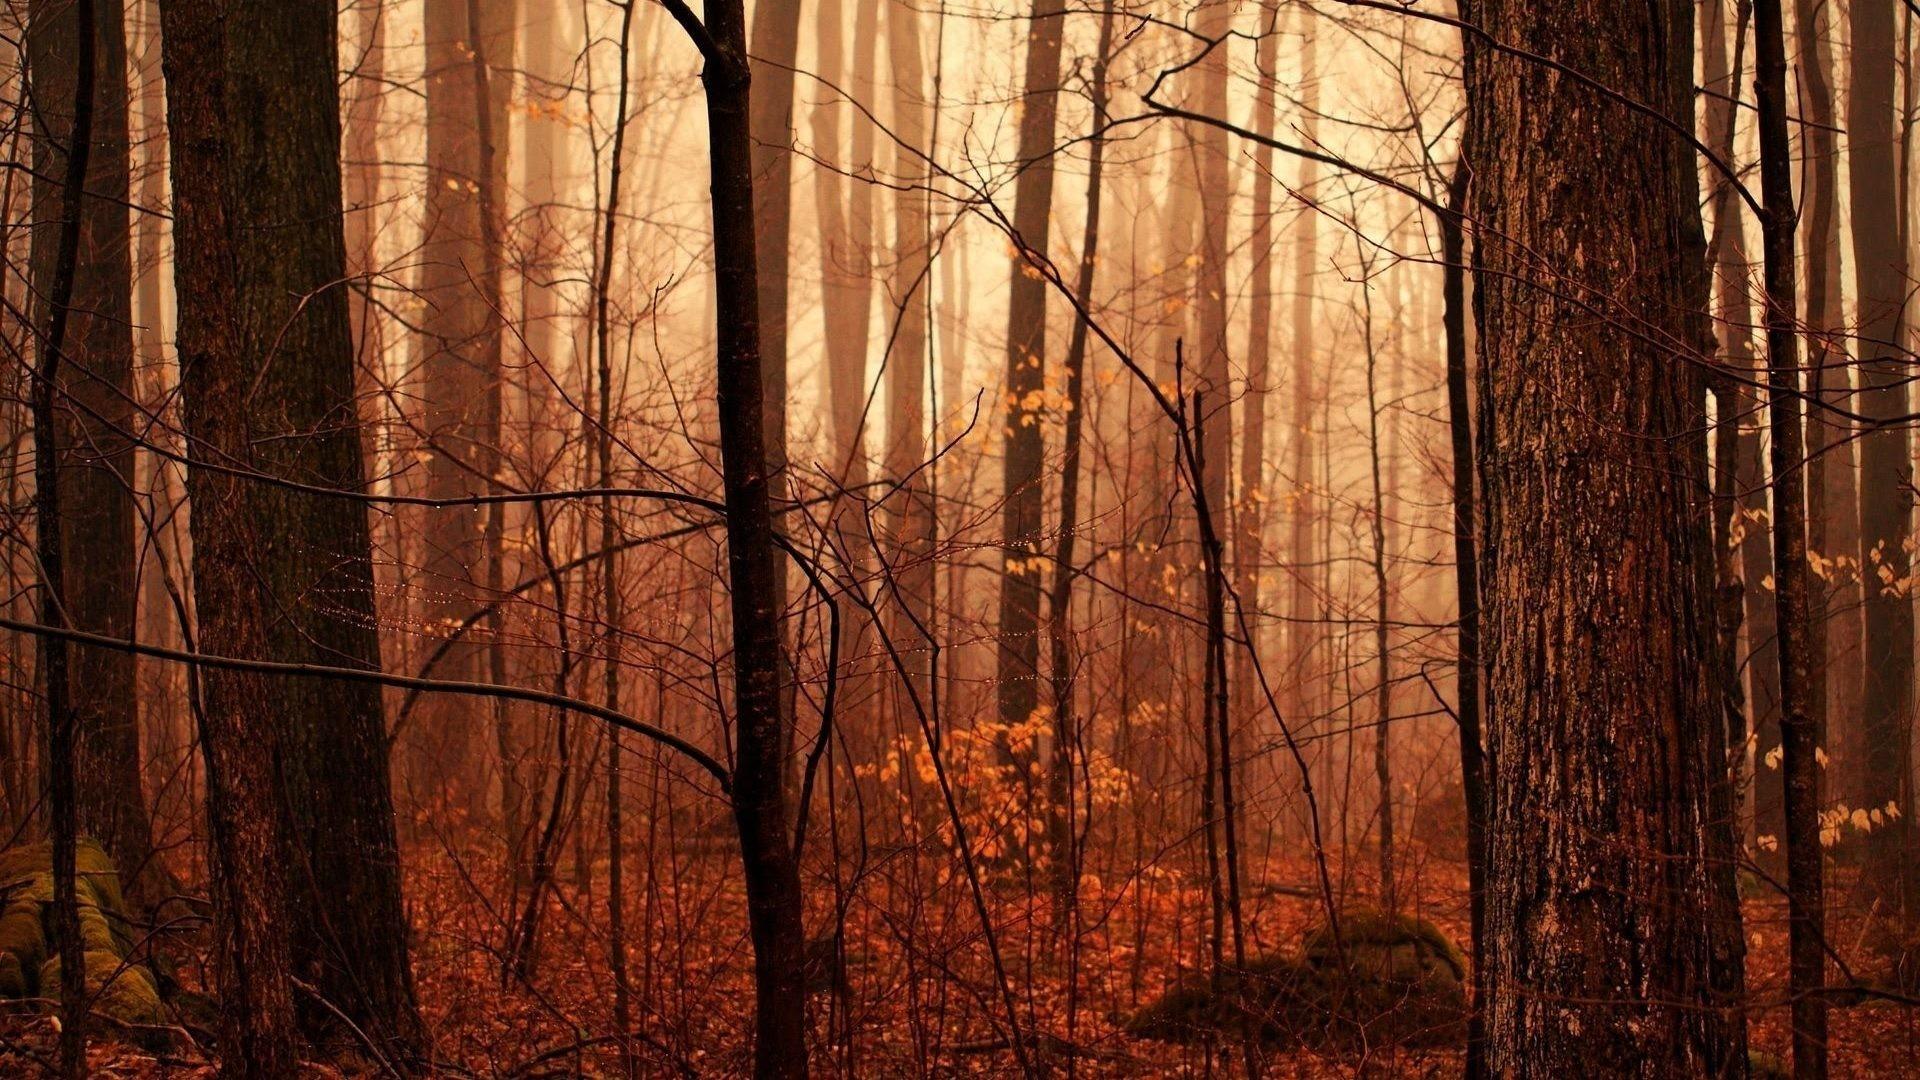 Wood Wallpaper 1080p 73 Images